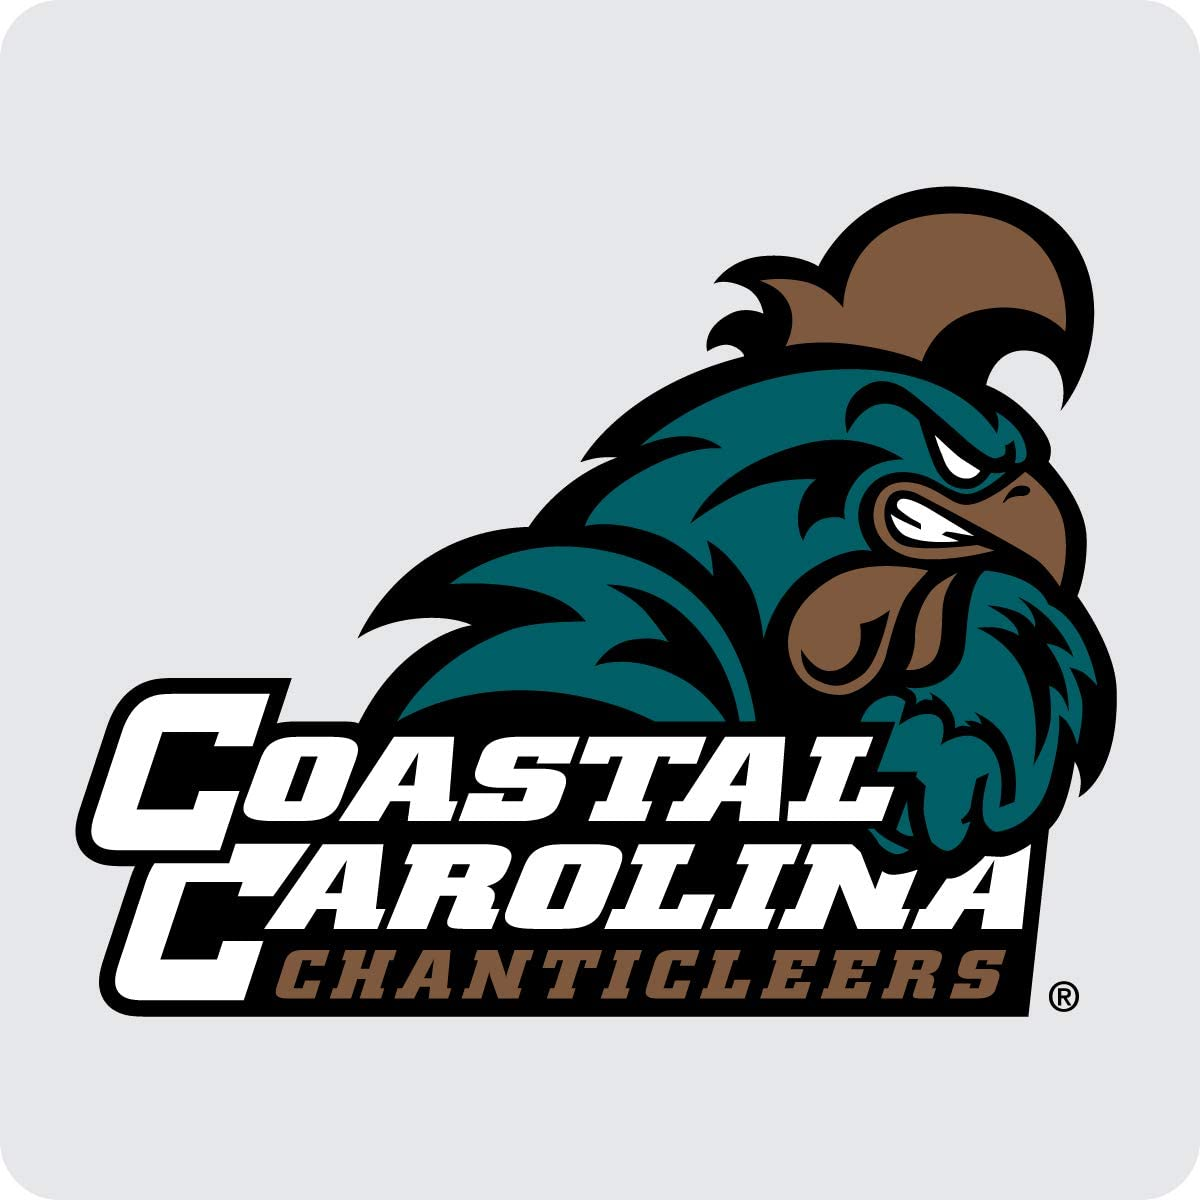 Max 90% OFF Coastal Carolina University Super sale period limited 4-Pack Acrylic Coaster